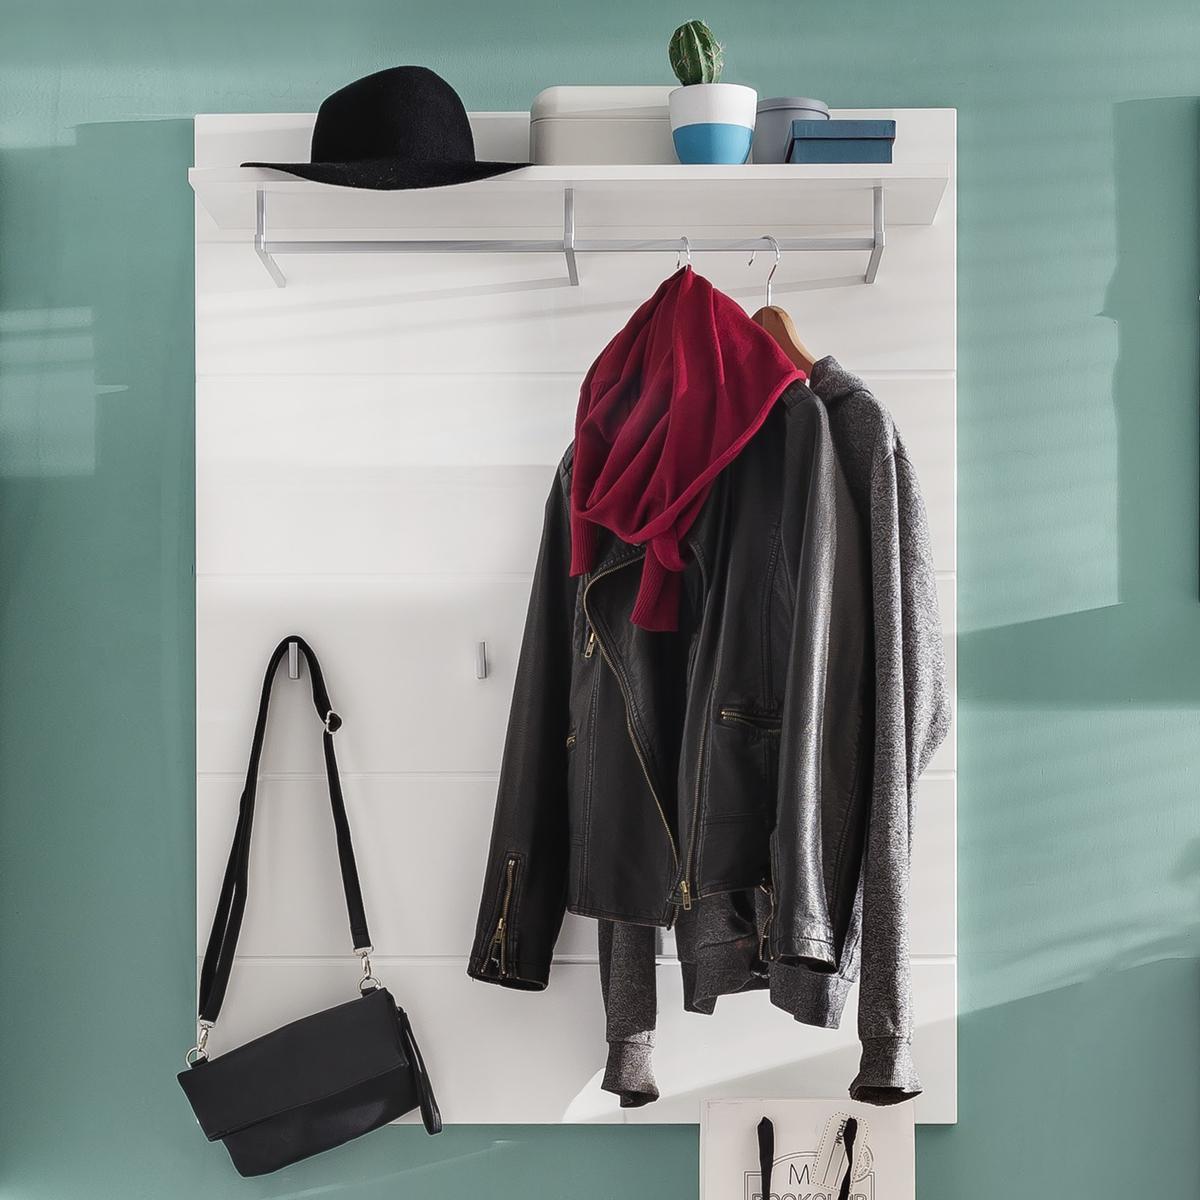 garderobenpaneel 1 amanda wandgarderobe in wei hochglanz paneel garderobe flur ebay. Black Bedroom Furniture Sets. Home Design Ideas